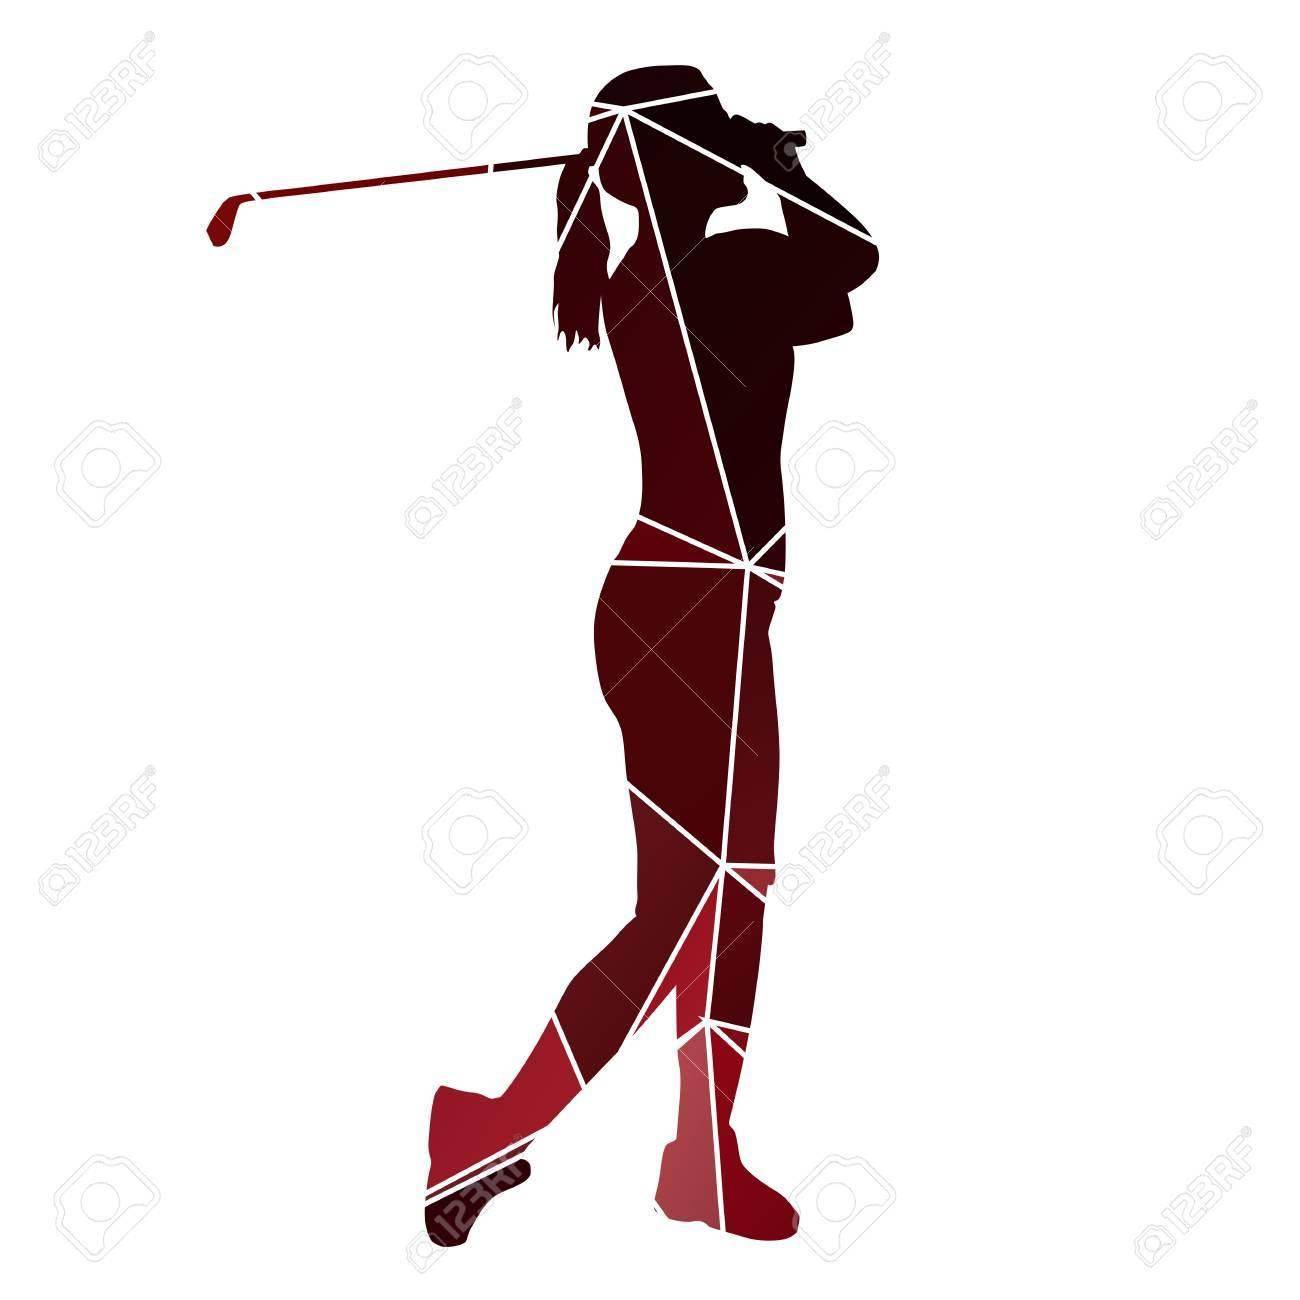 Golf Woman Red Geometric Lady Golfer Silhouette Royalty Free